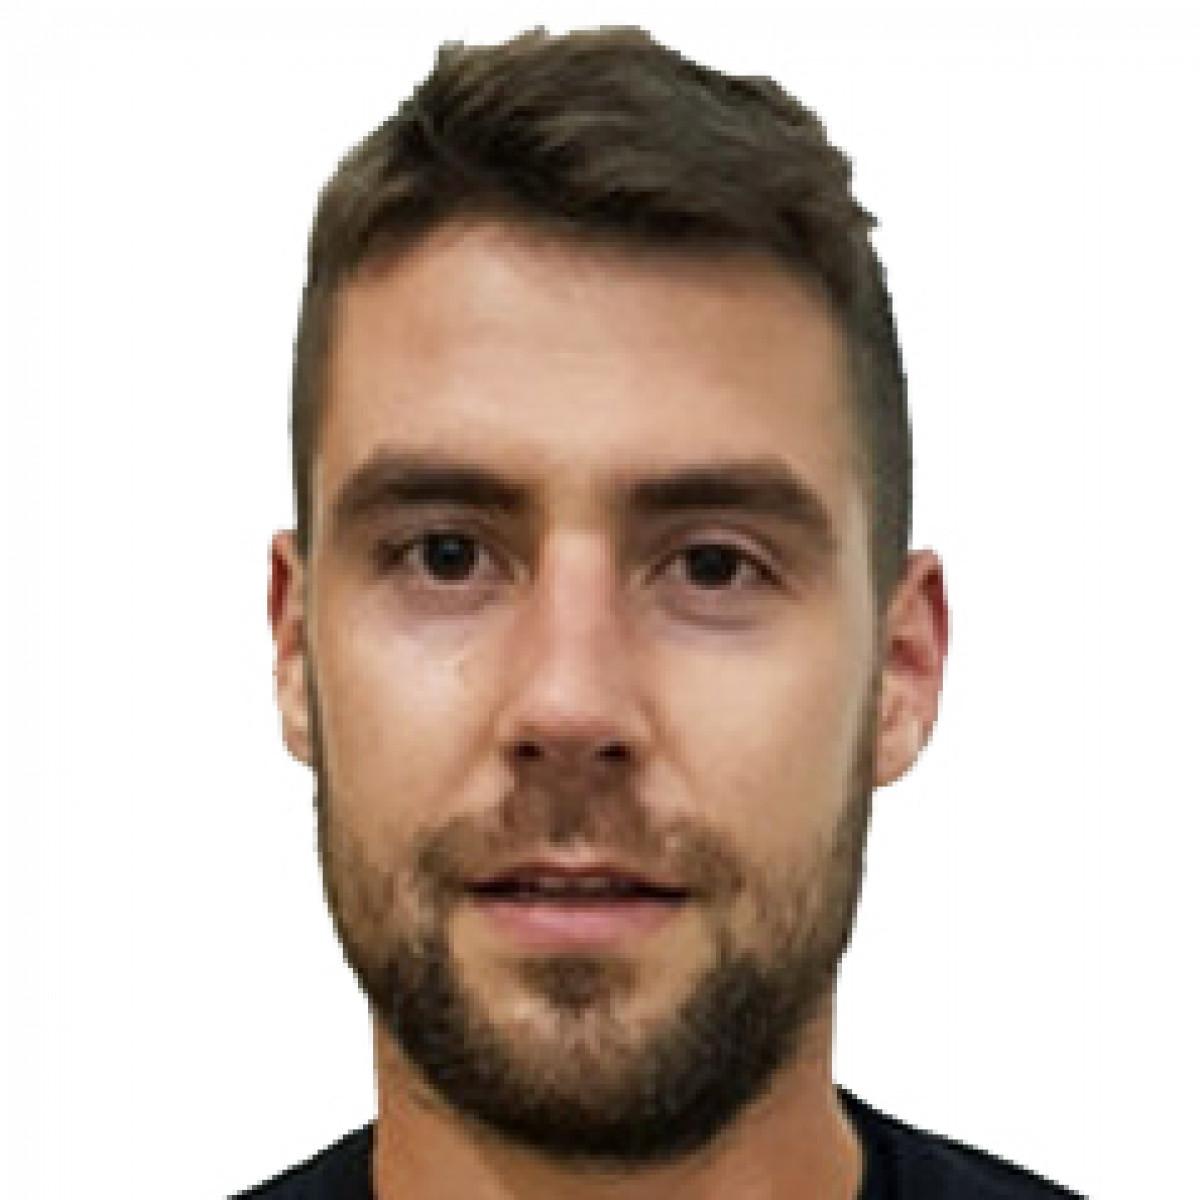 Michal Musijowski